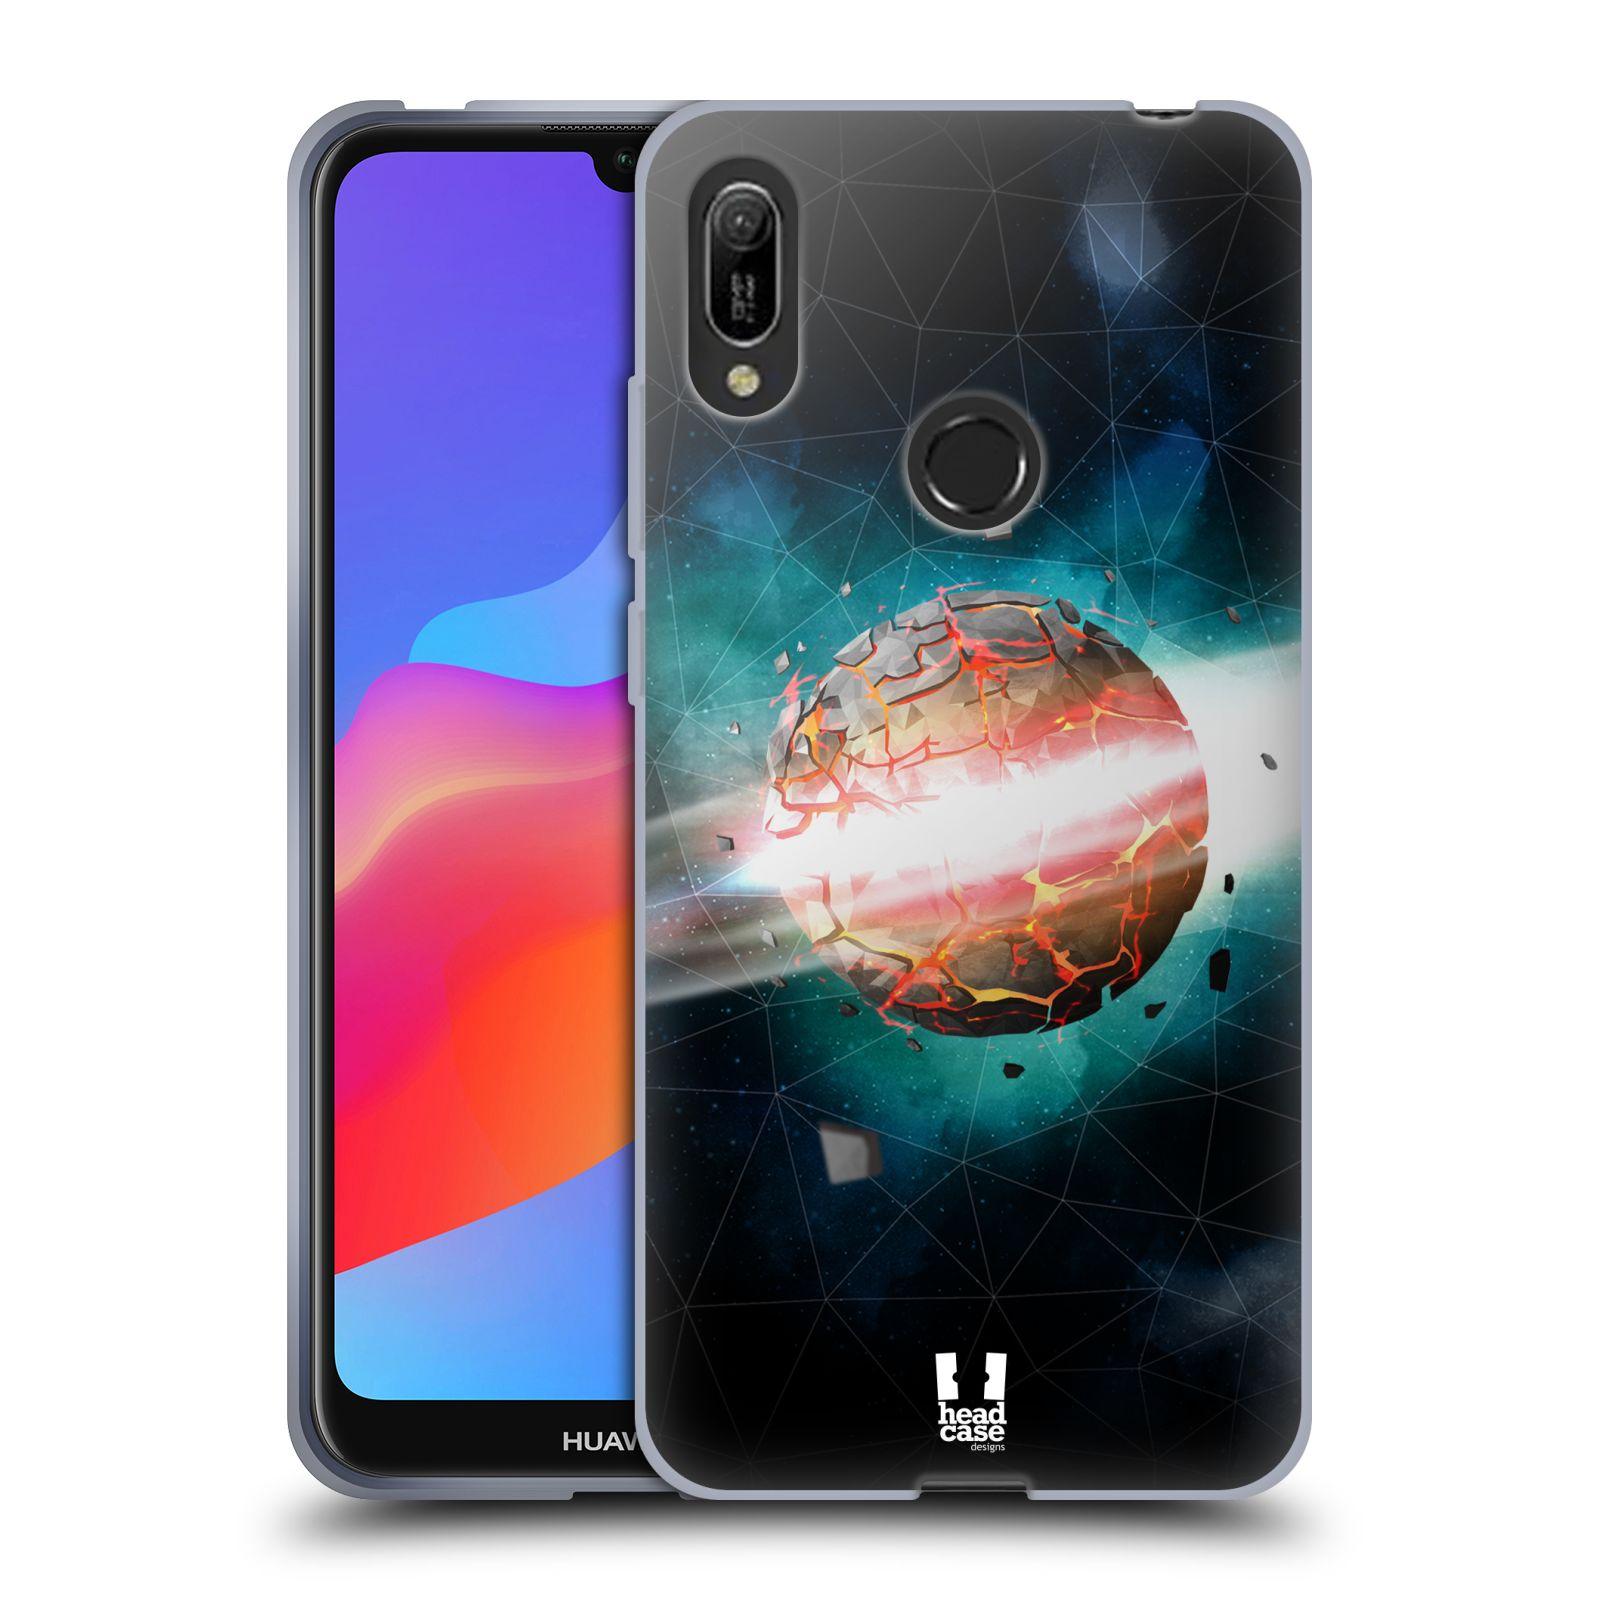 Silikonové pouzdro na mobil Huawei Y6 (2019) - Head Case - UNIVERSE EXPLOSION